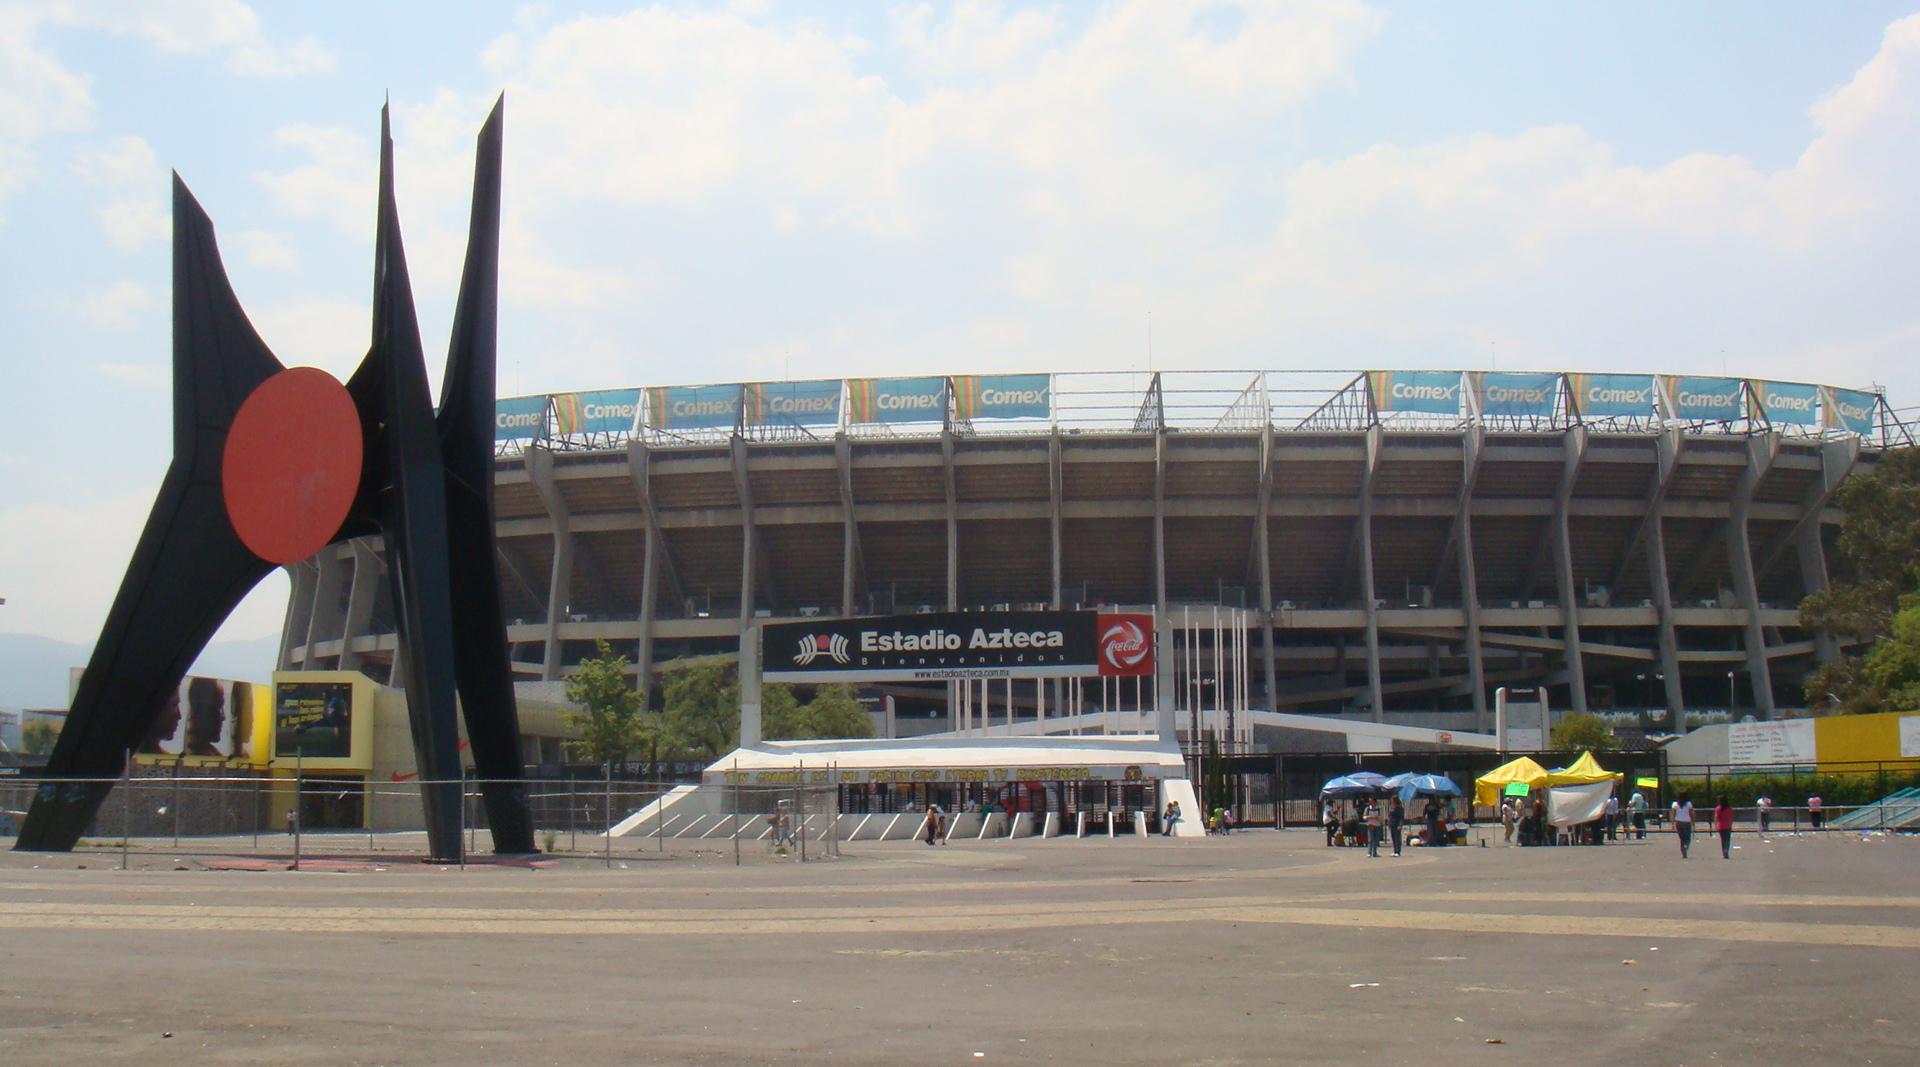 Templo futbolero